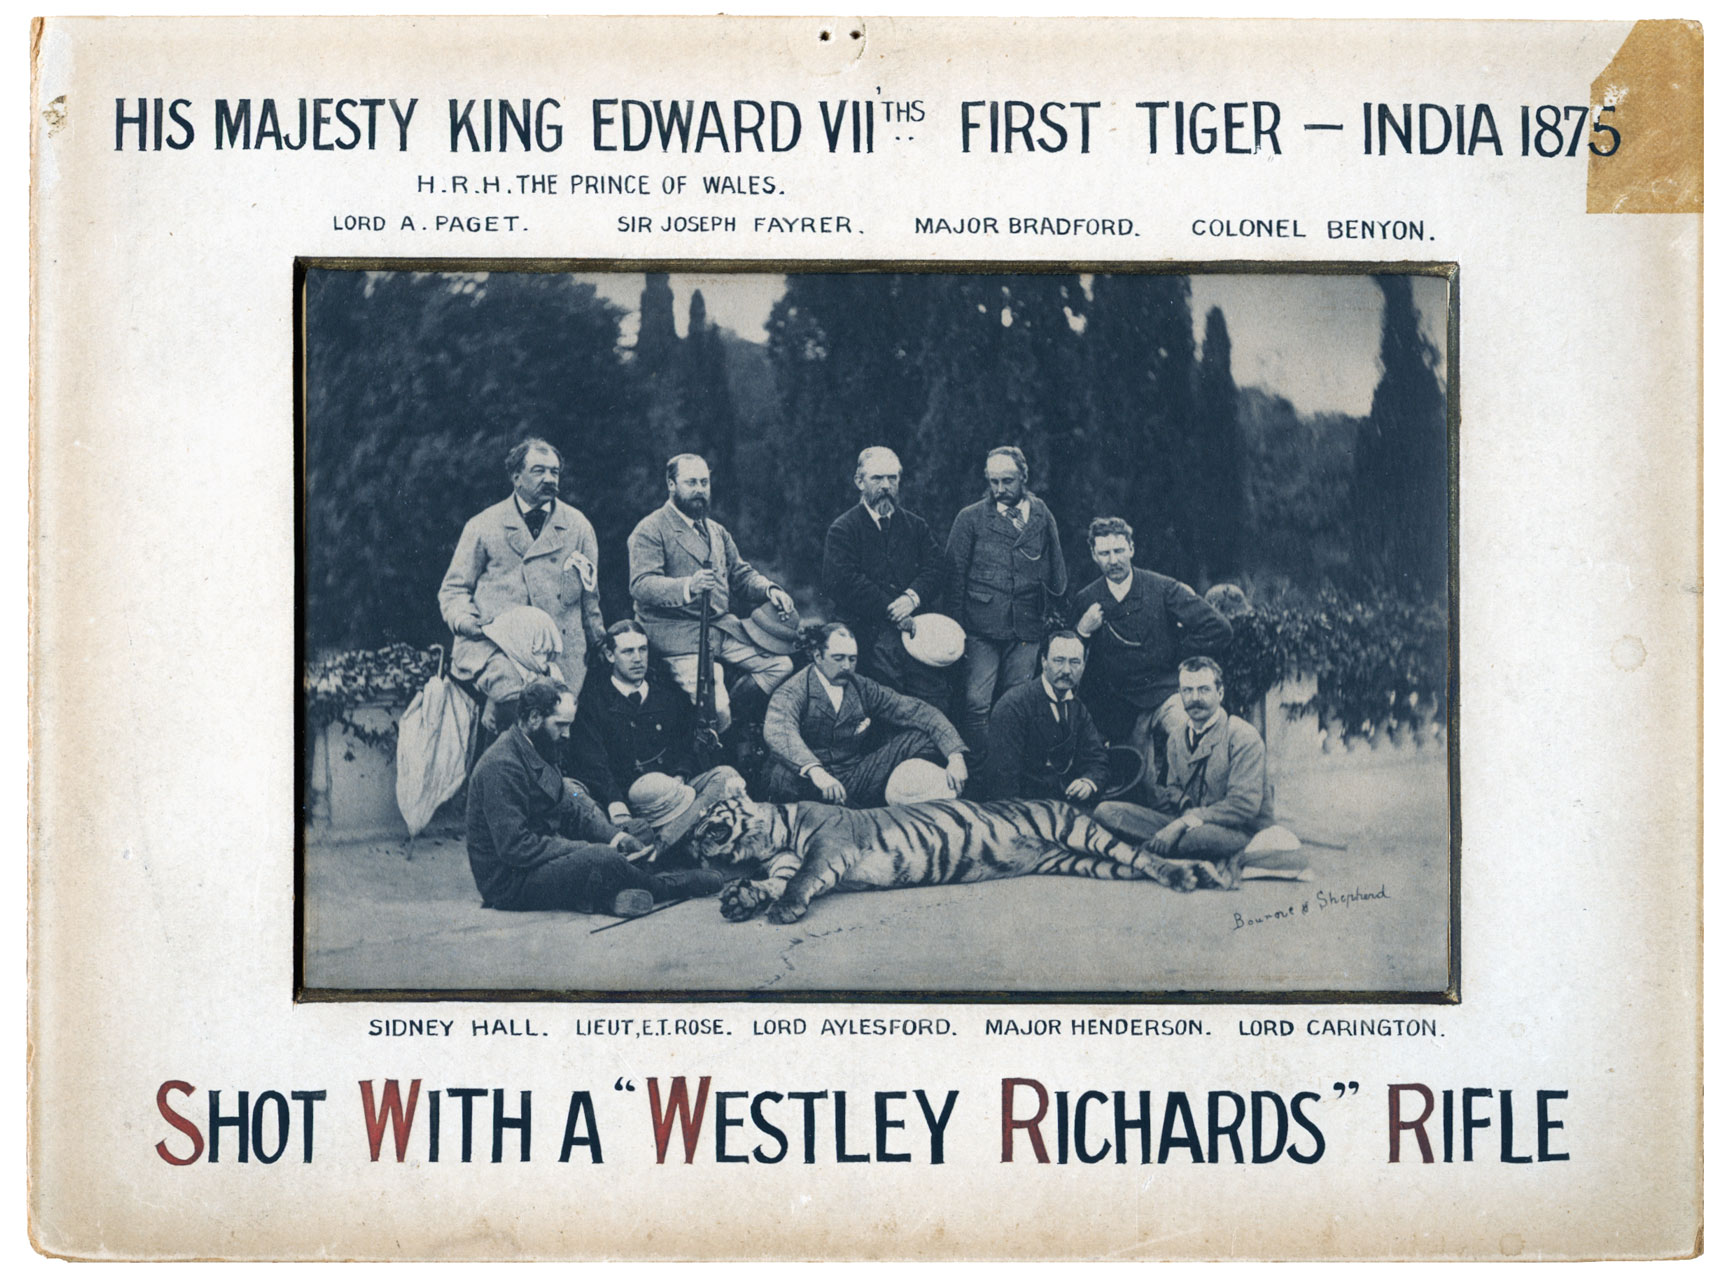 King-Edward-1st-Tiger